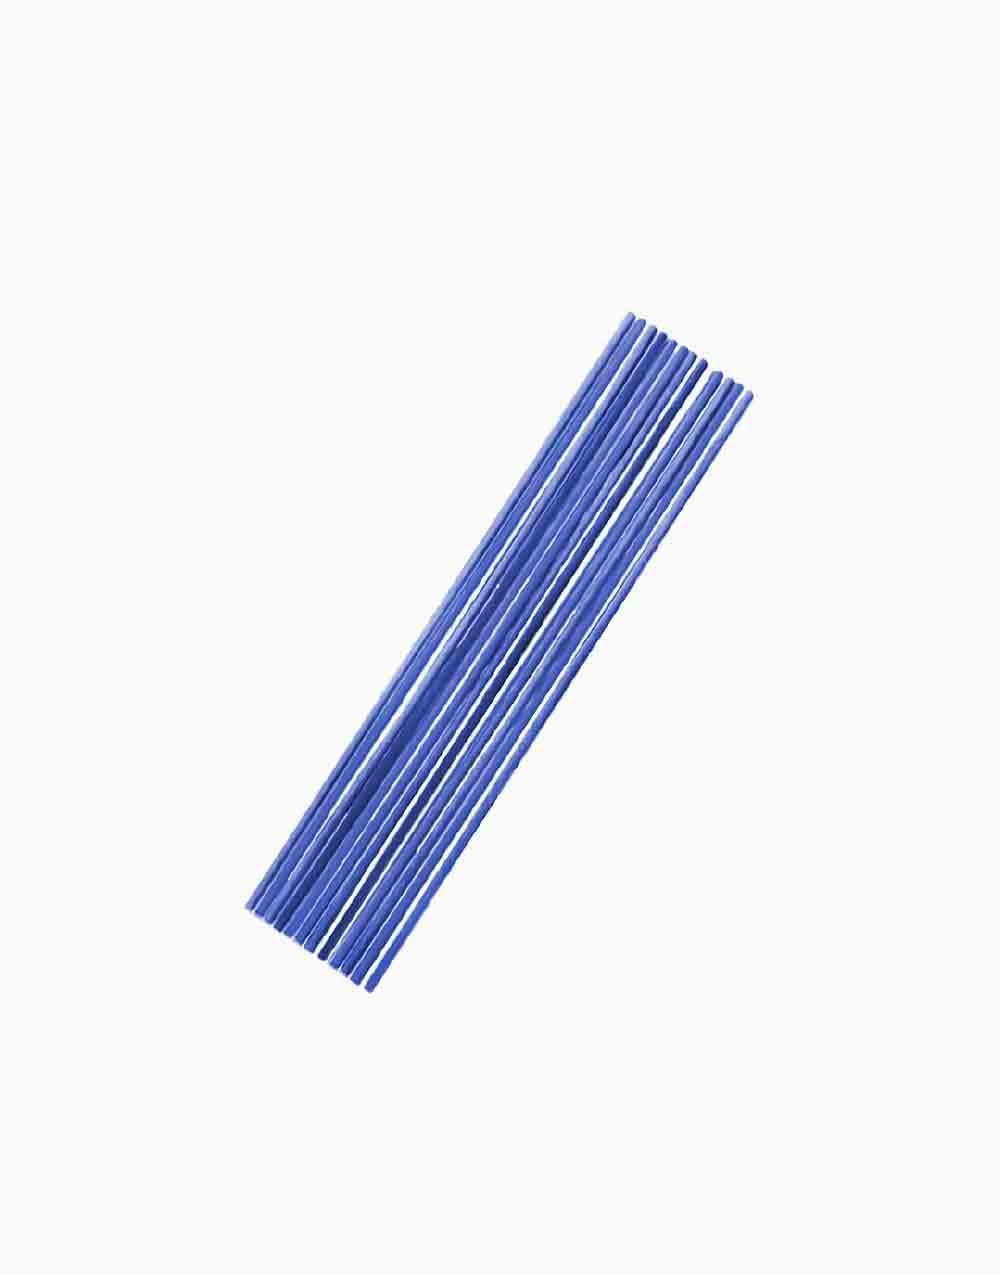 "POREX ""No-Flip"" E-reed Stick 12s Bundle (10"") by Pure Bliss | Blue"